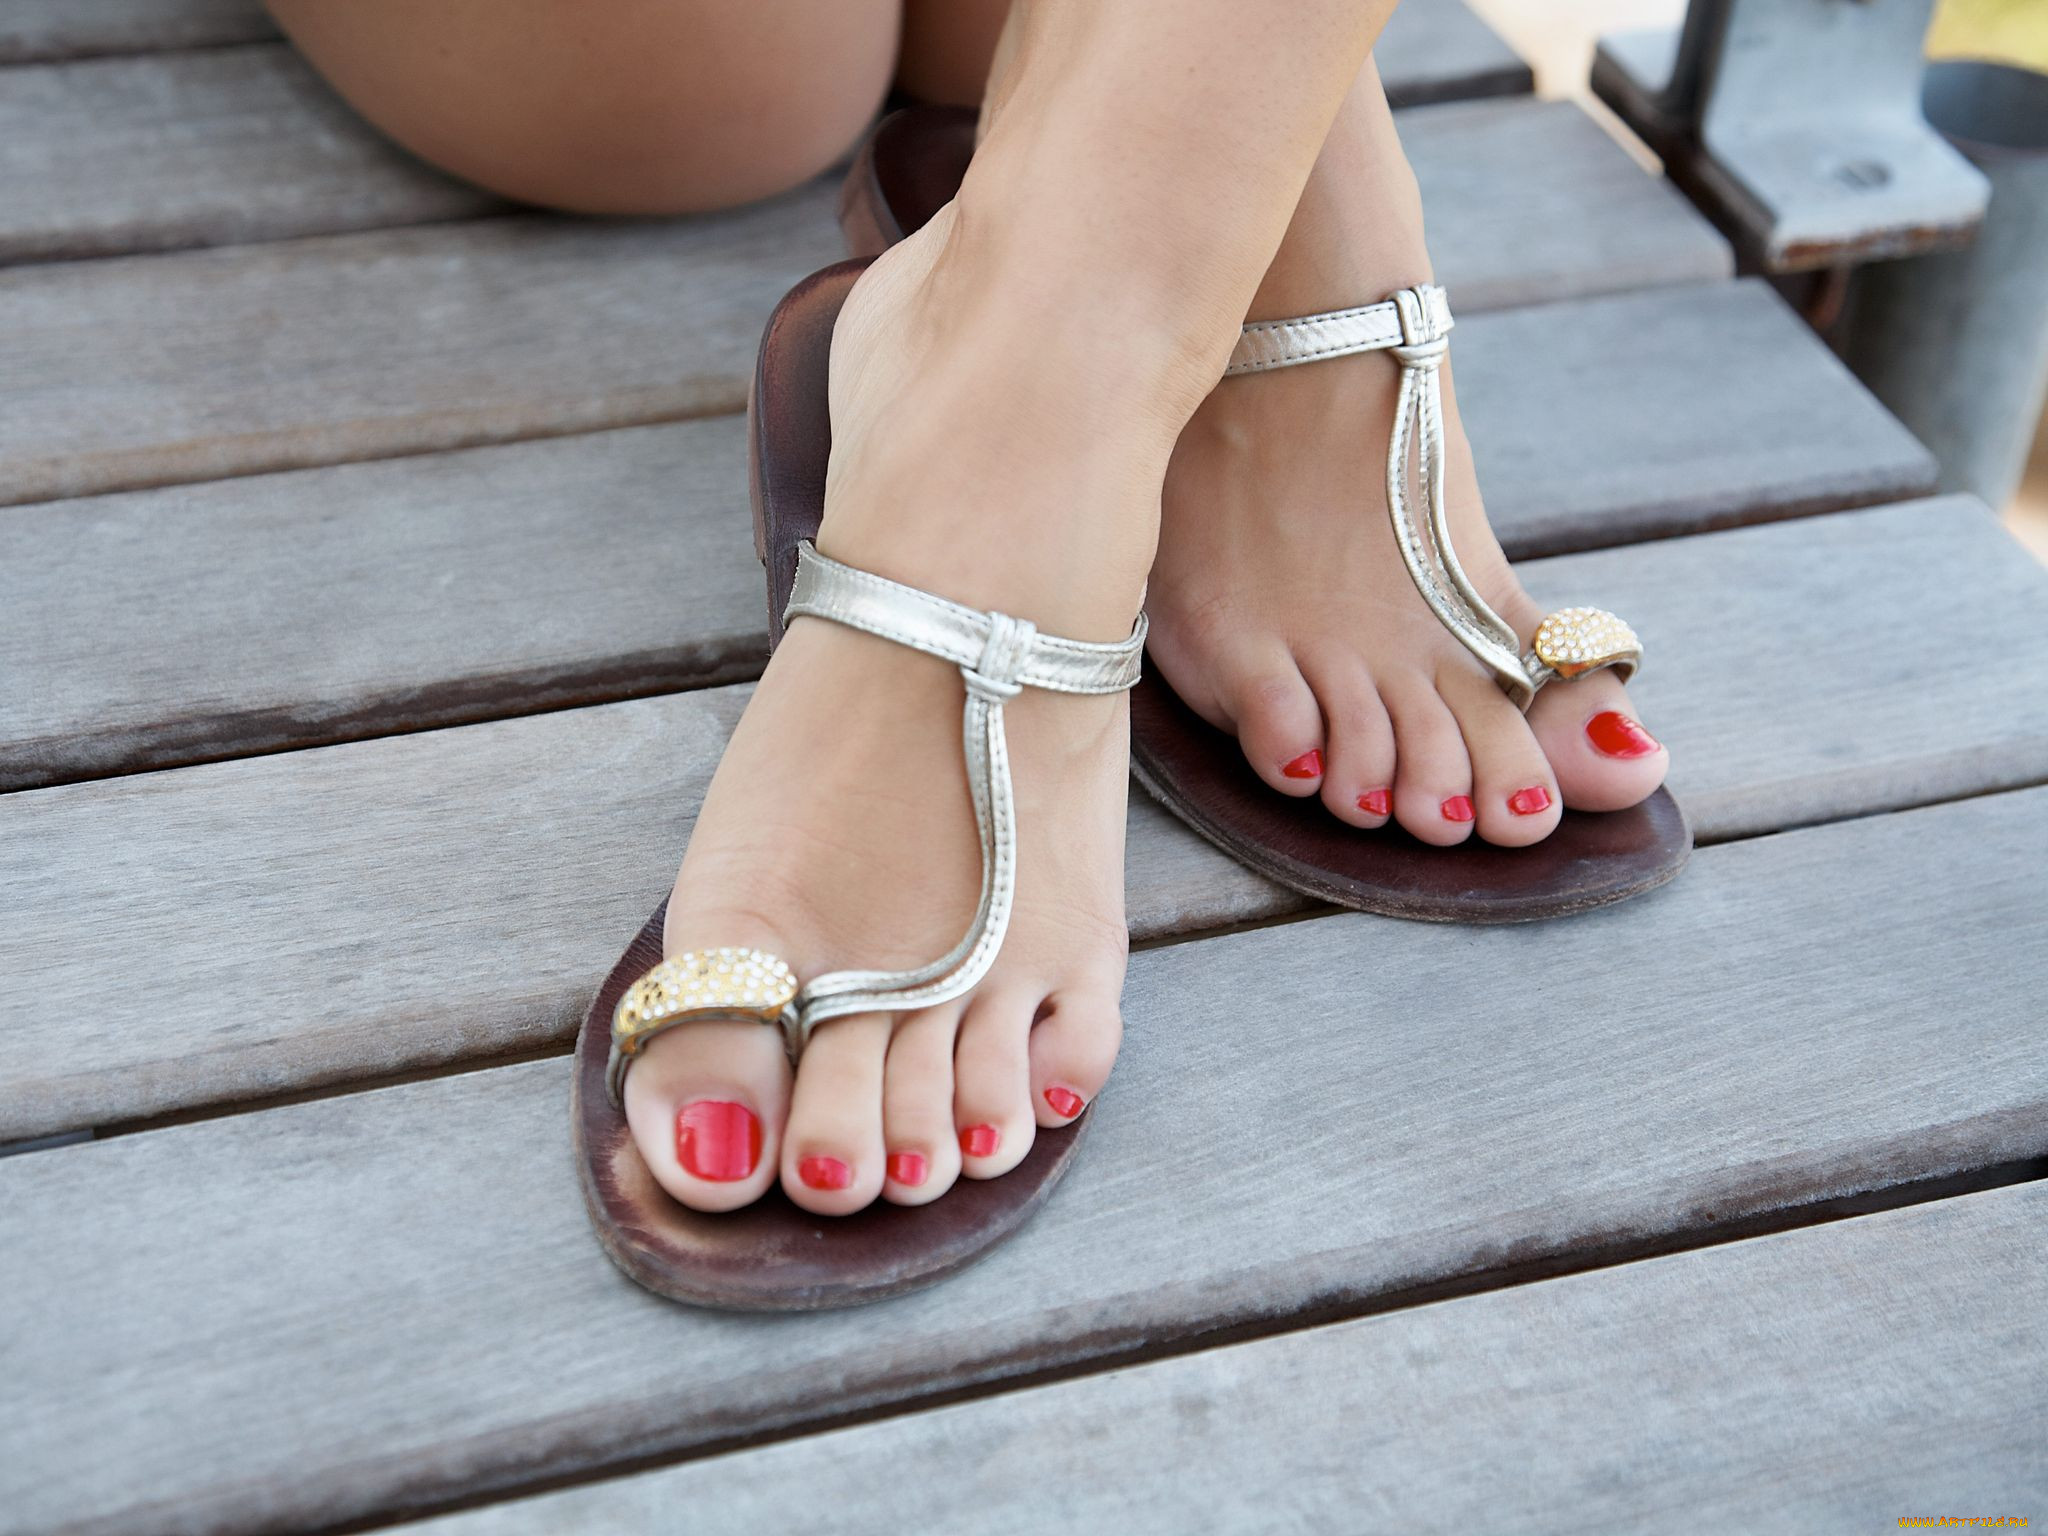 Фото красивые ножки педикюр 5